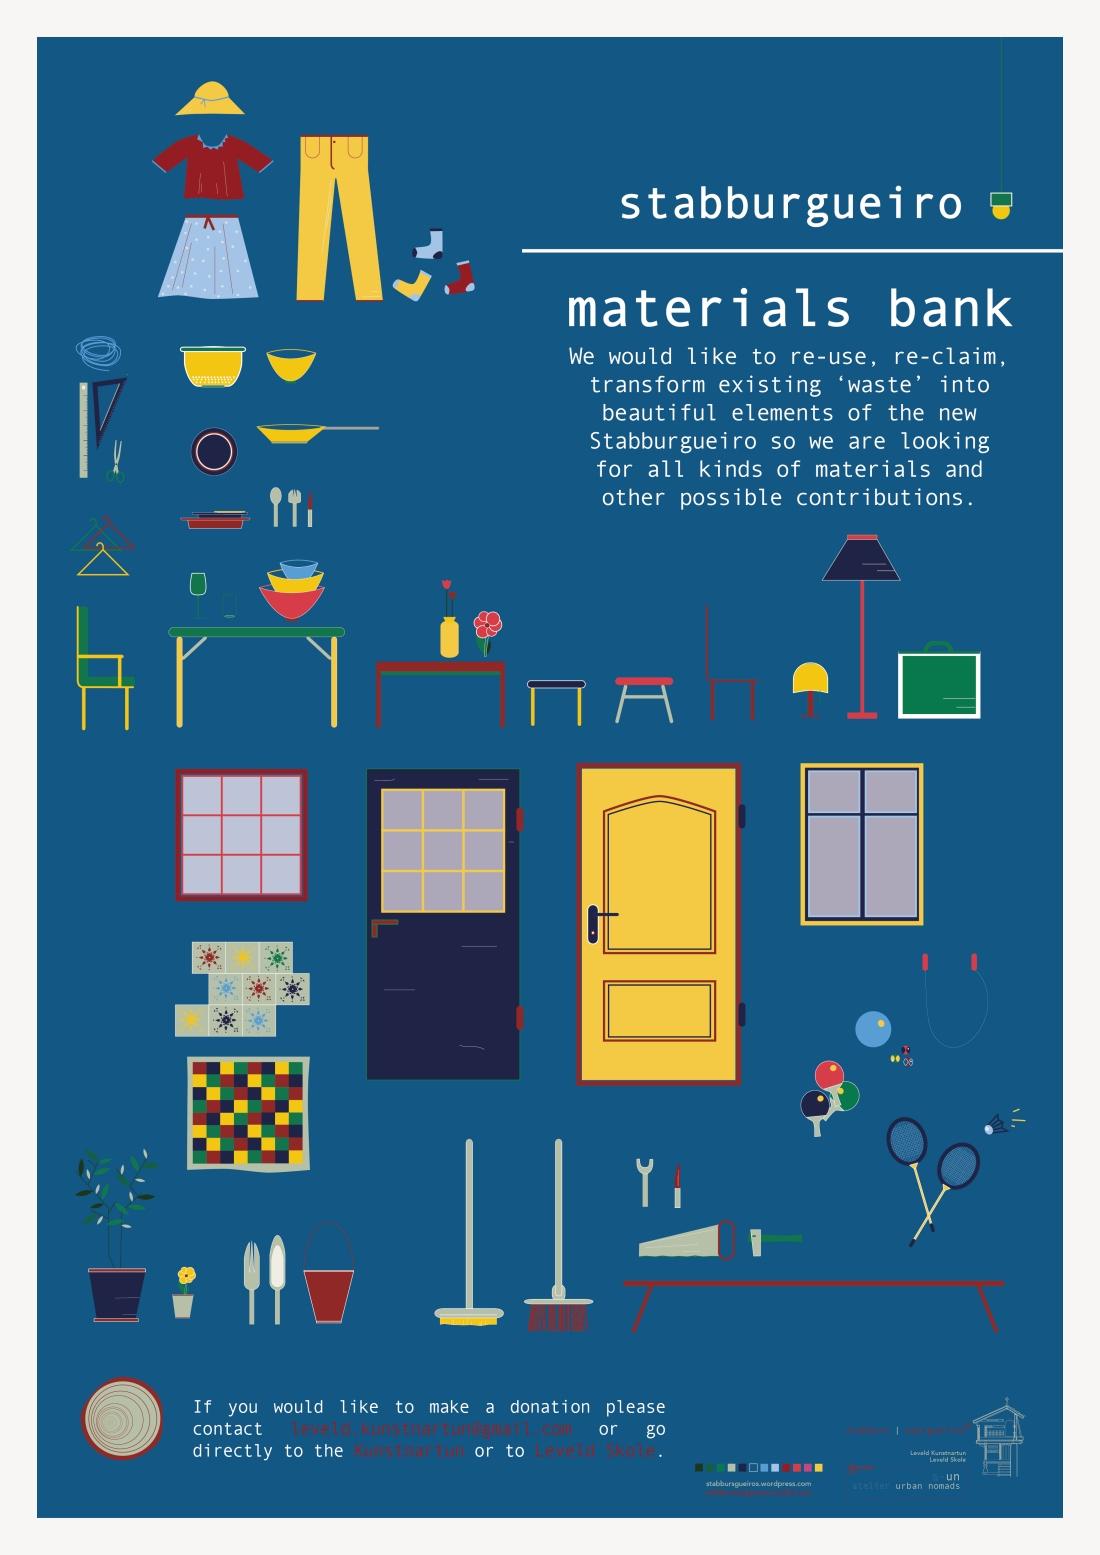 Material Bank_stabburgueiros-01